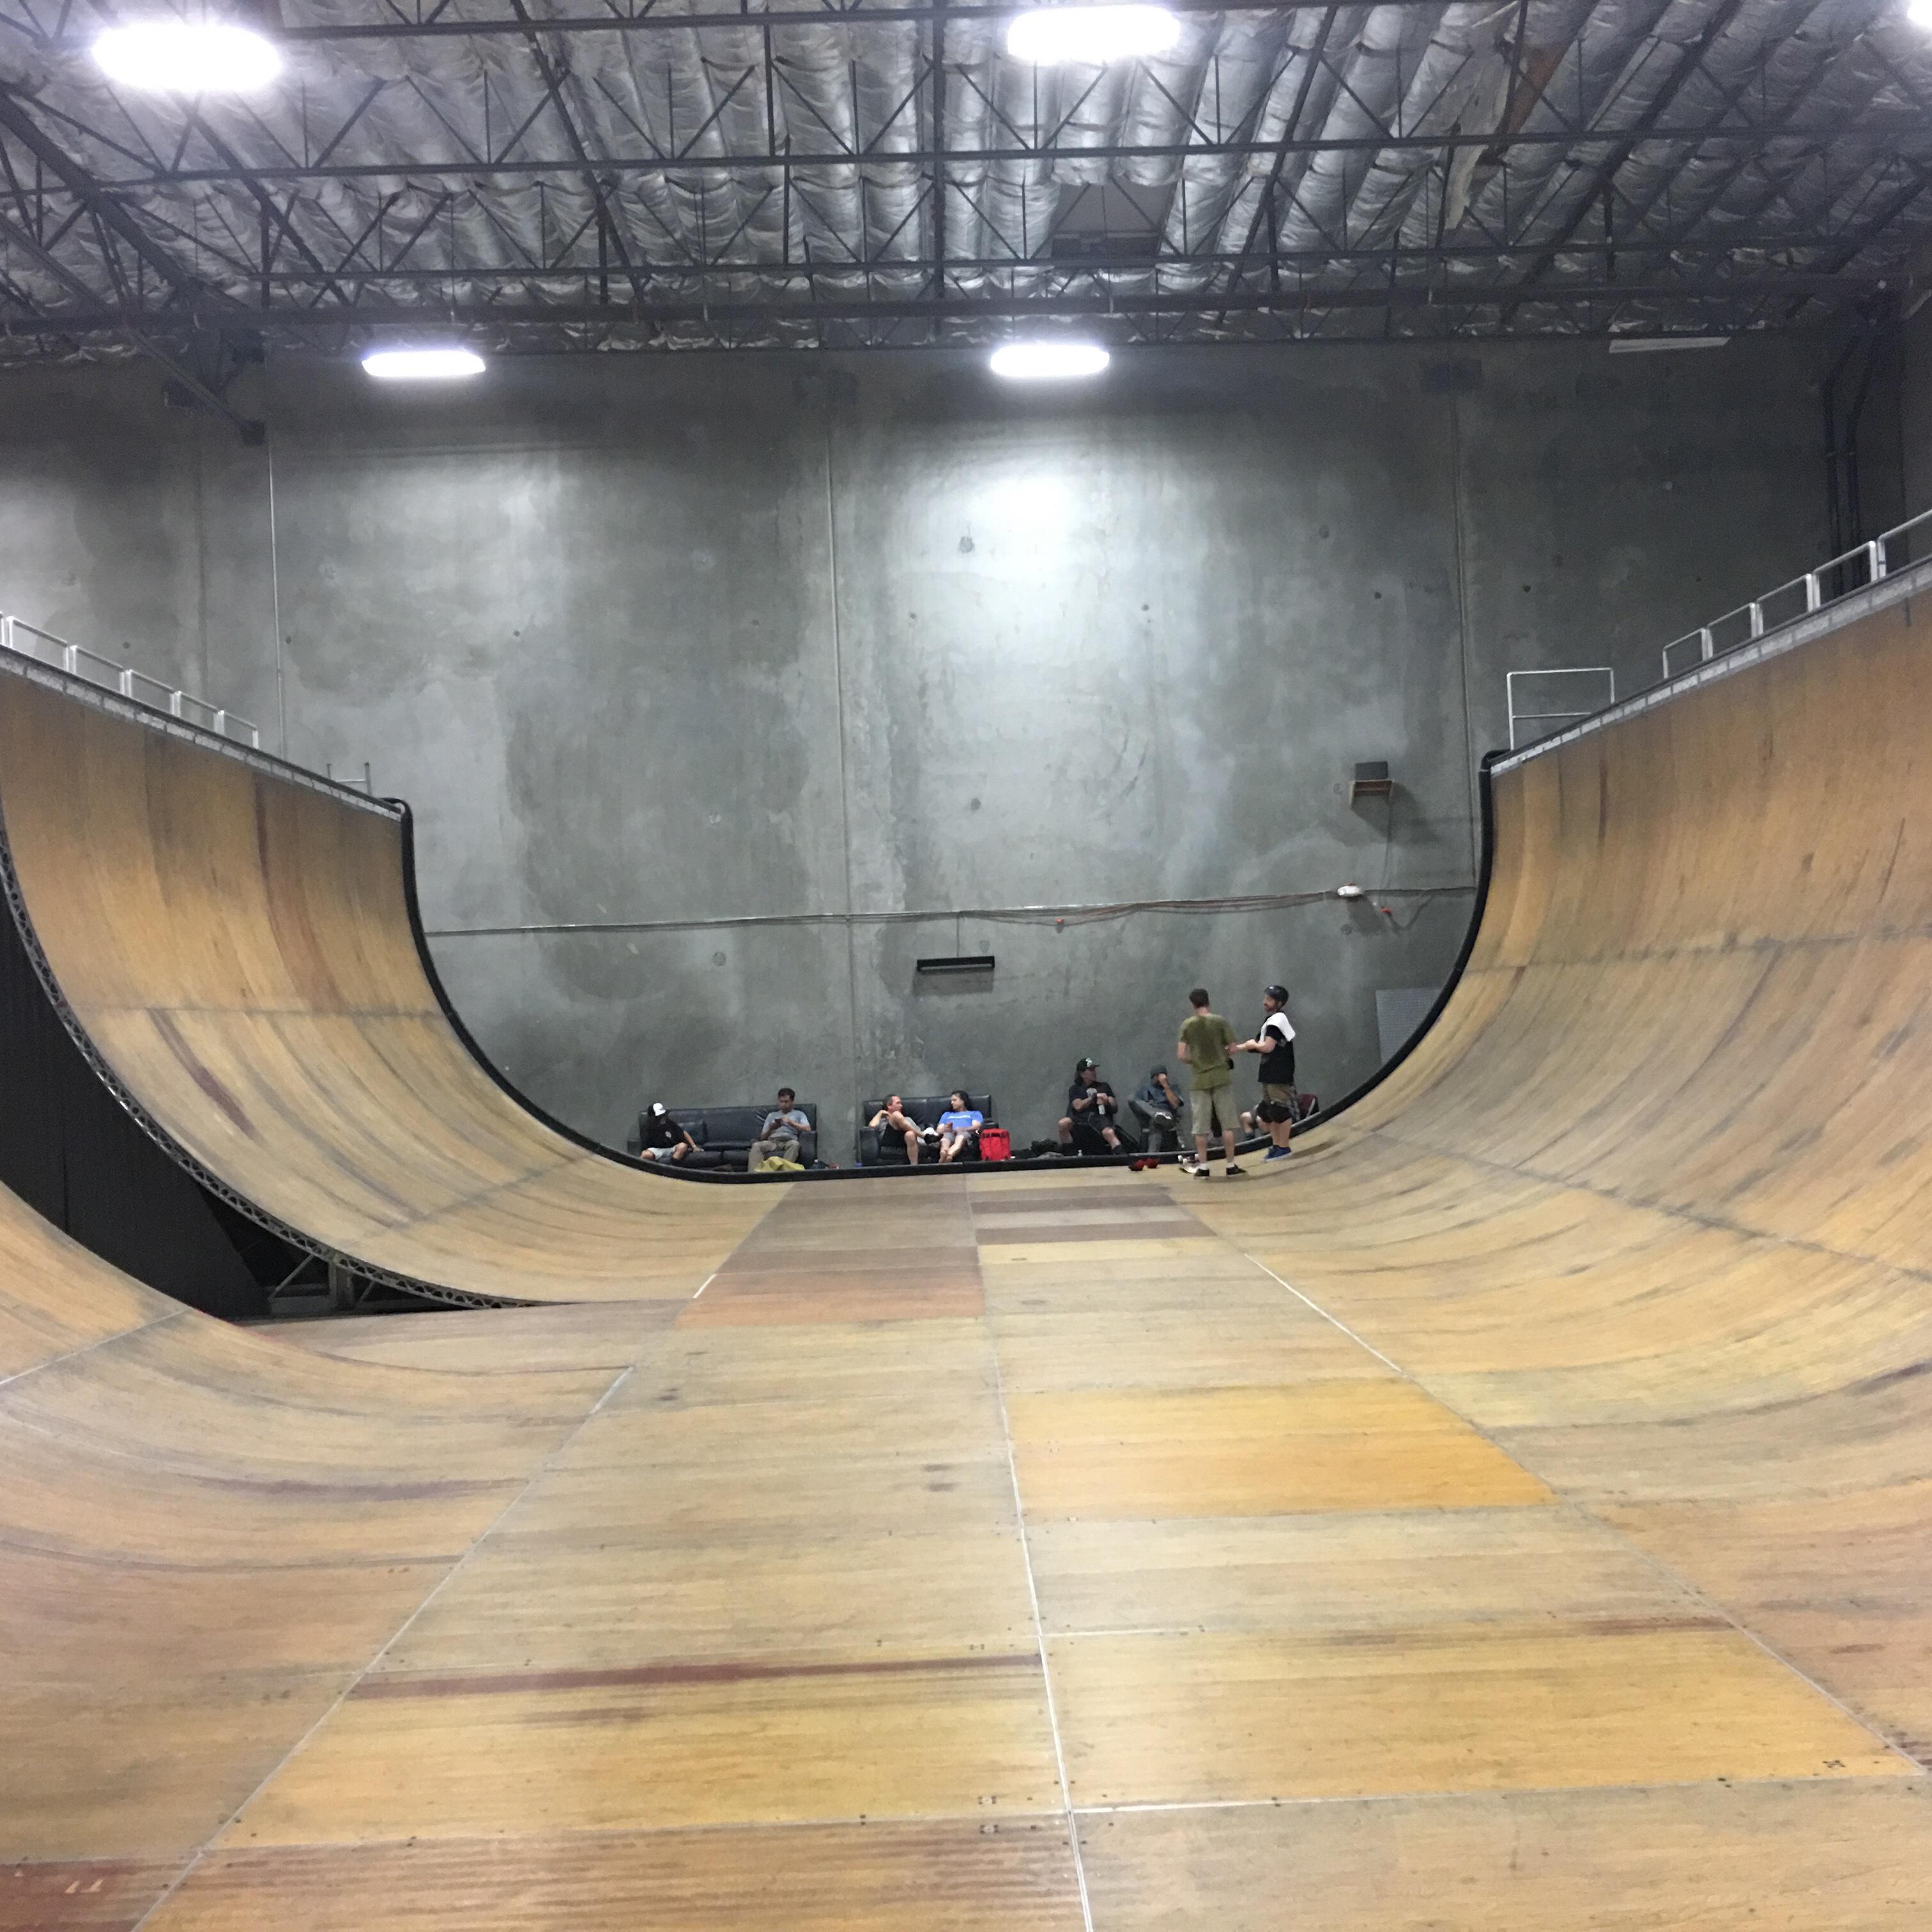 Tonys Ramp, maybe the best vert ramp ever build